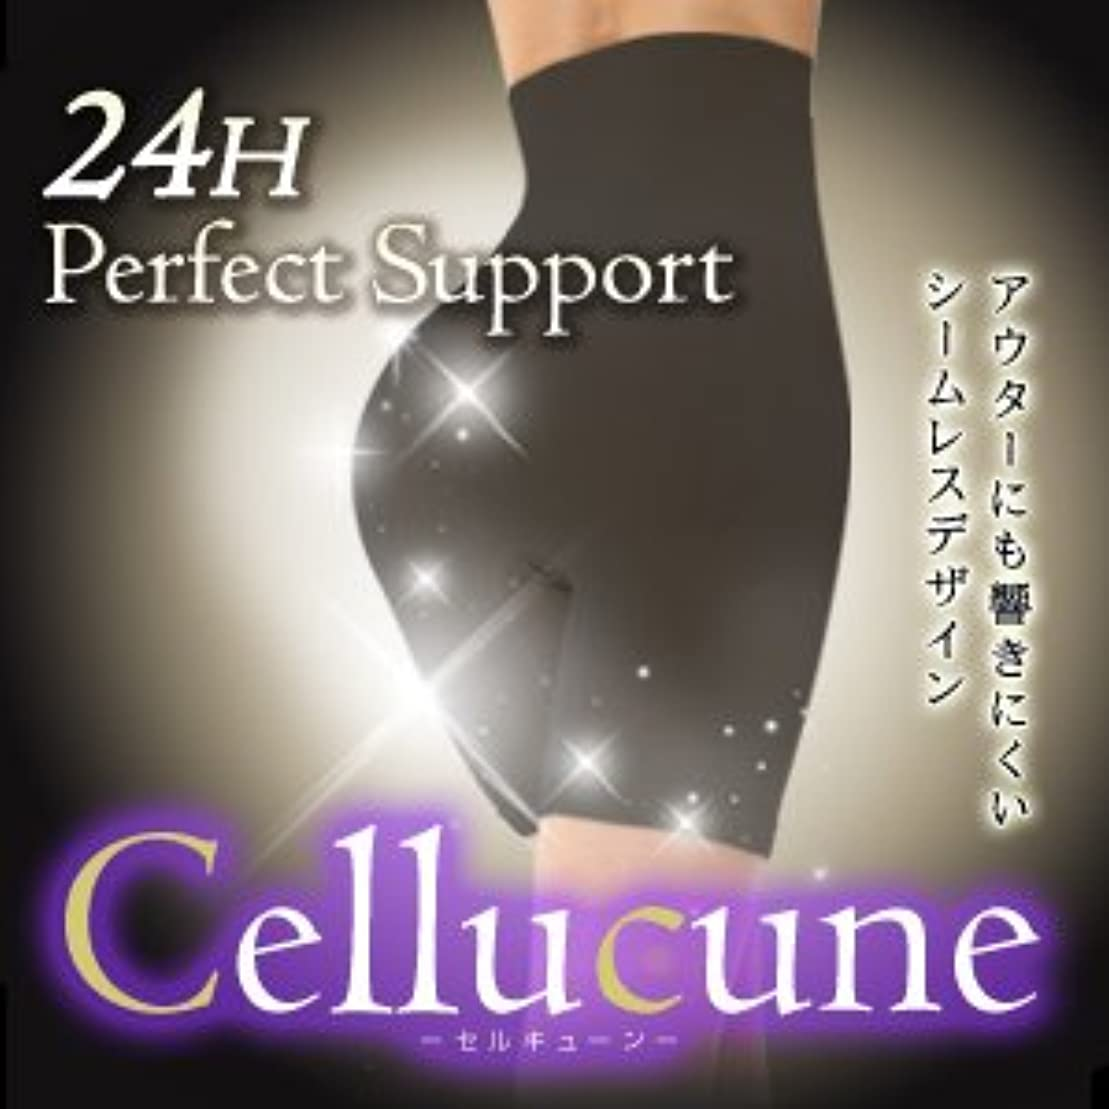 【M-L】セルキューン -Cellucune- 痩身特化骨盤補正ショーツ